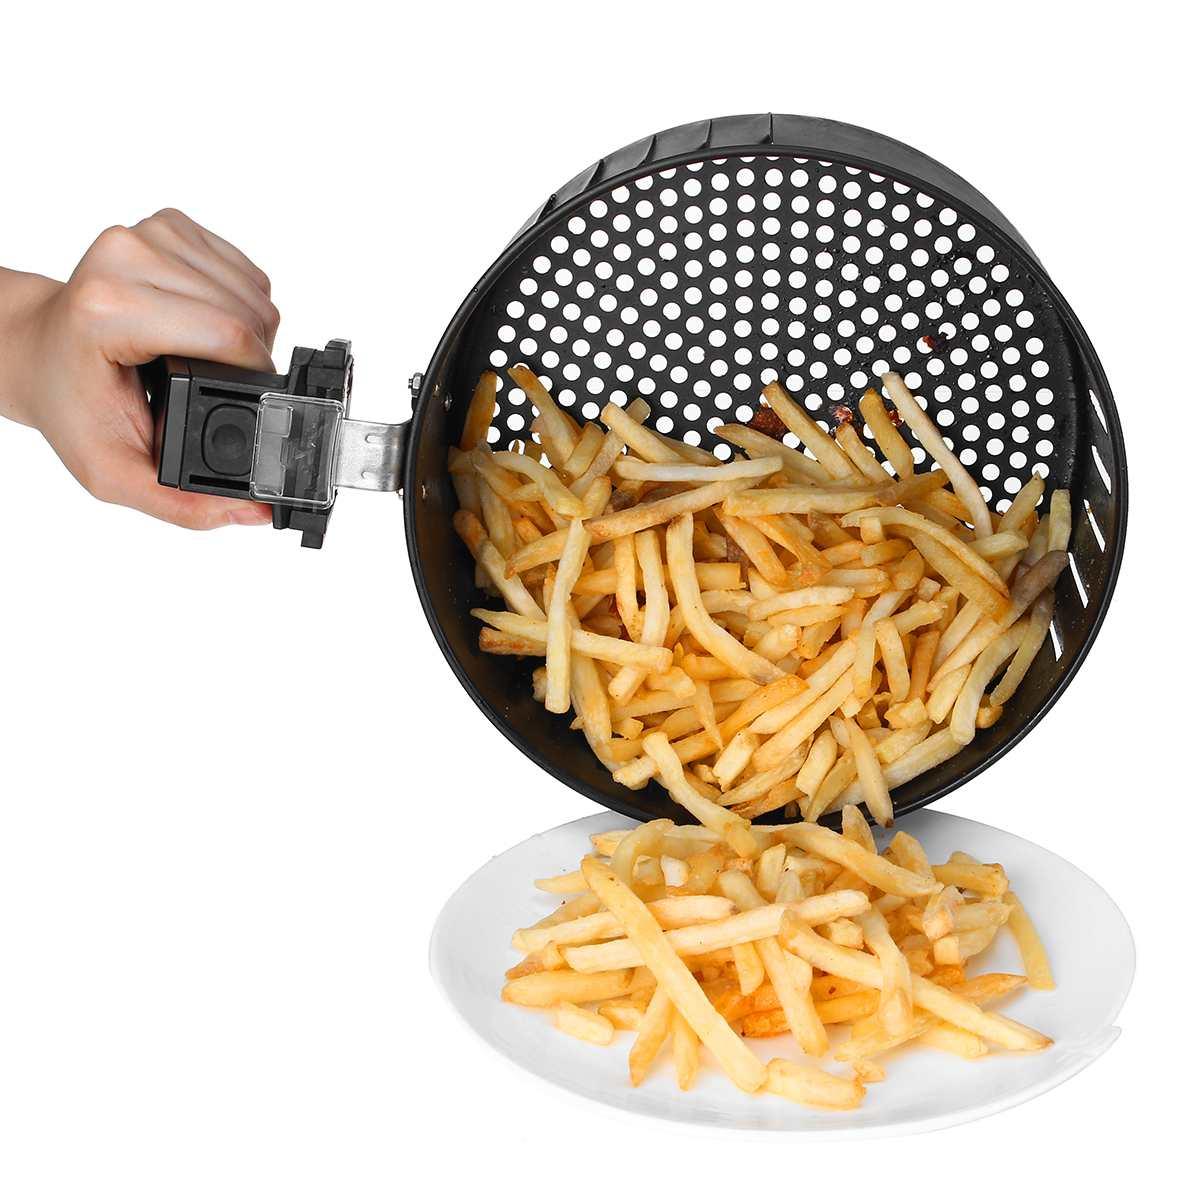 Smart Oil Free Fryer-Healthy Cooking